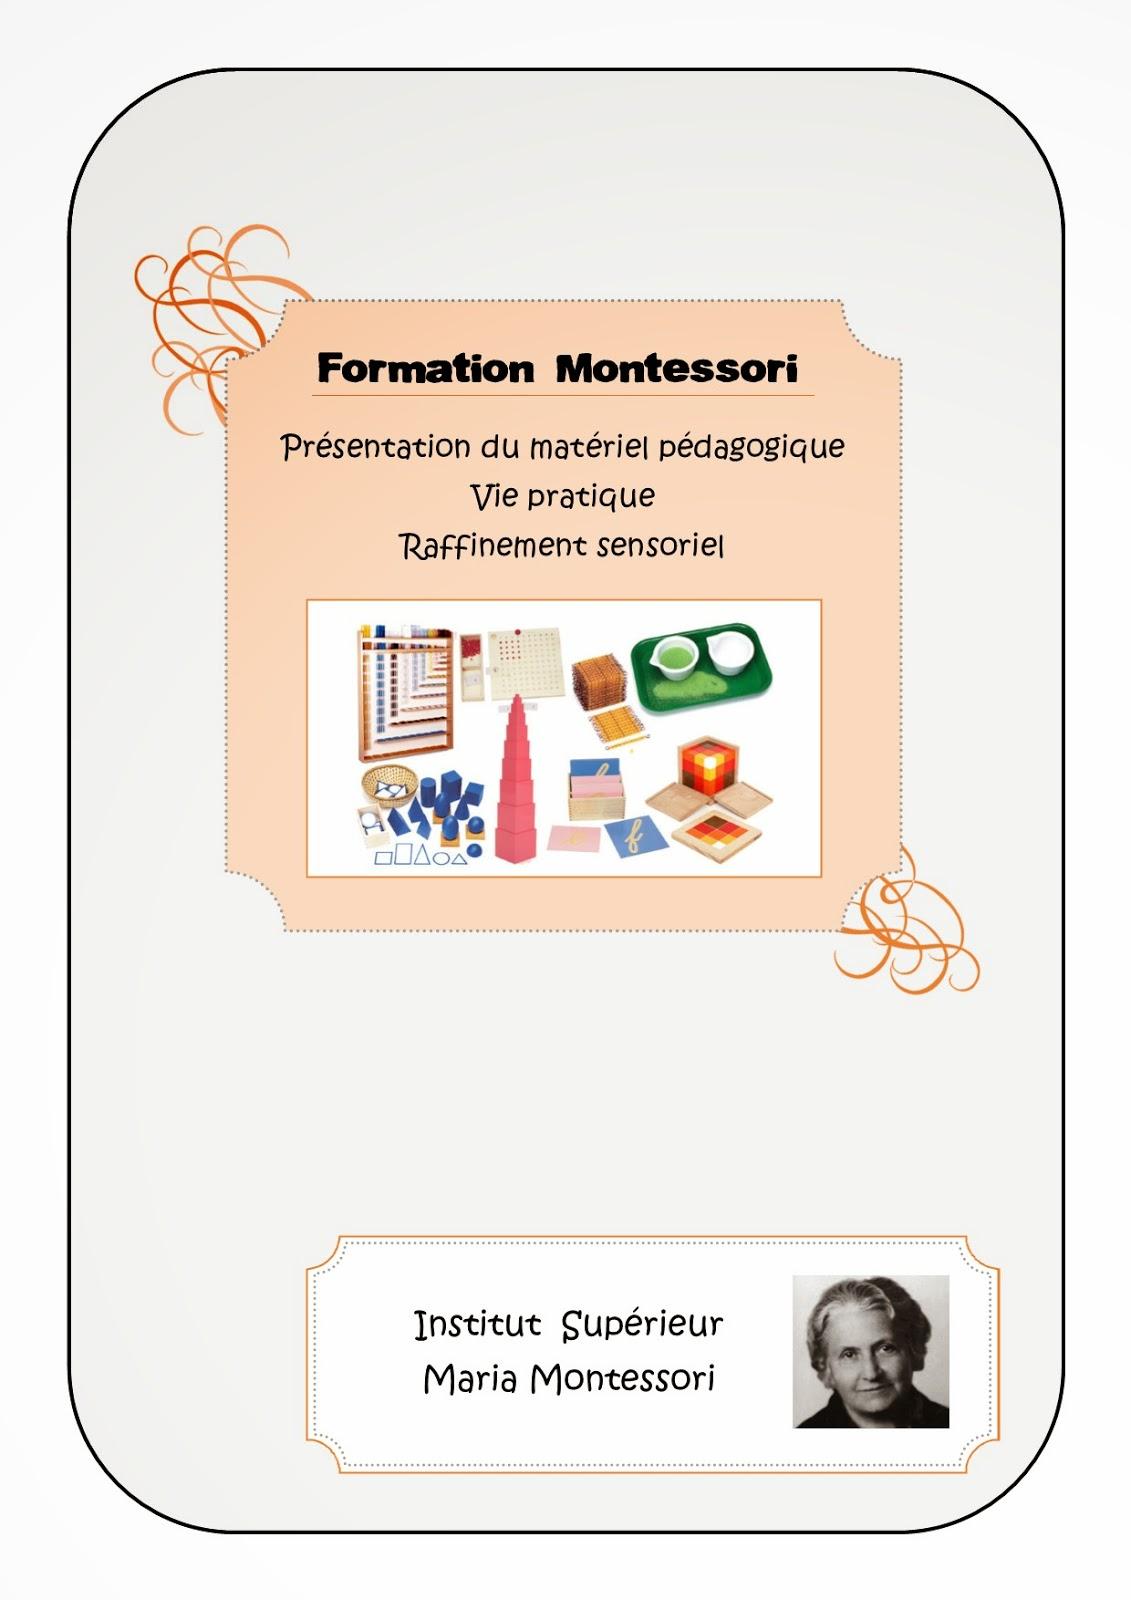 Compte-rendu formation Montessori #3